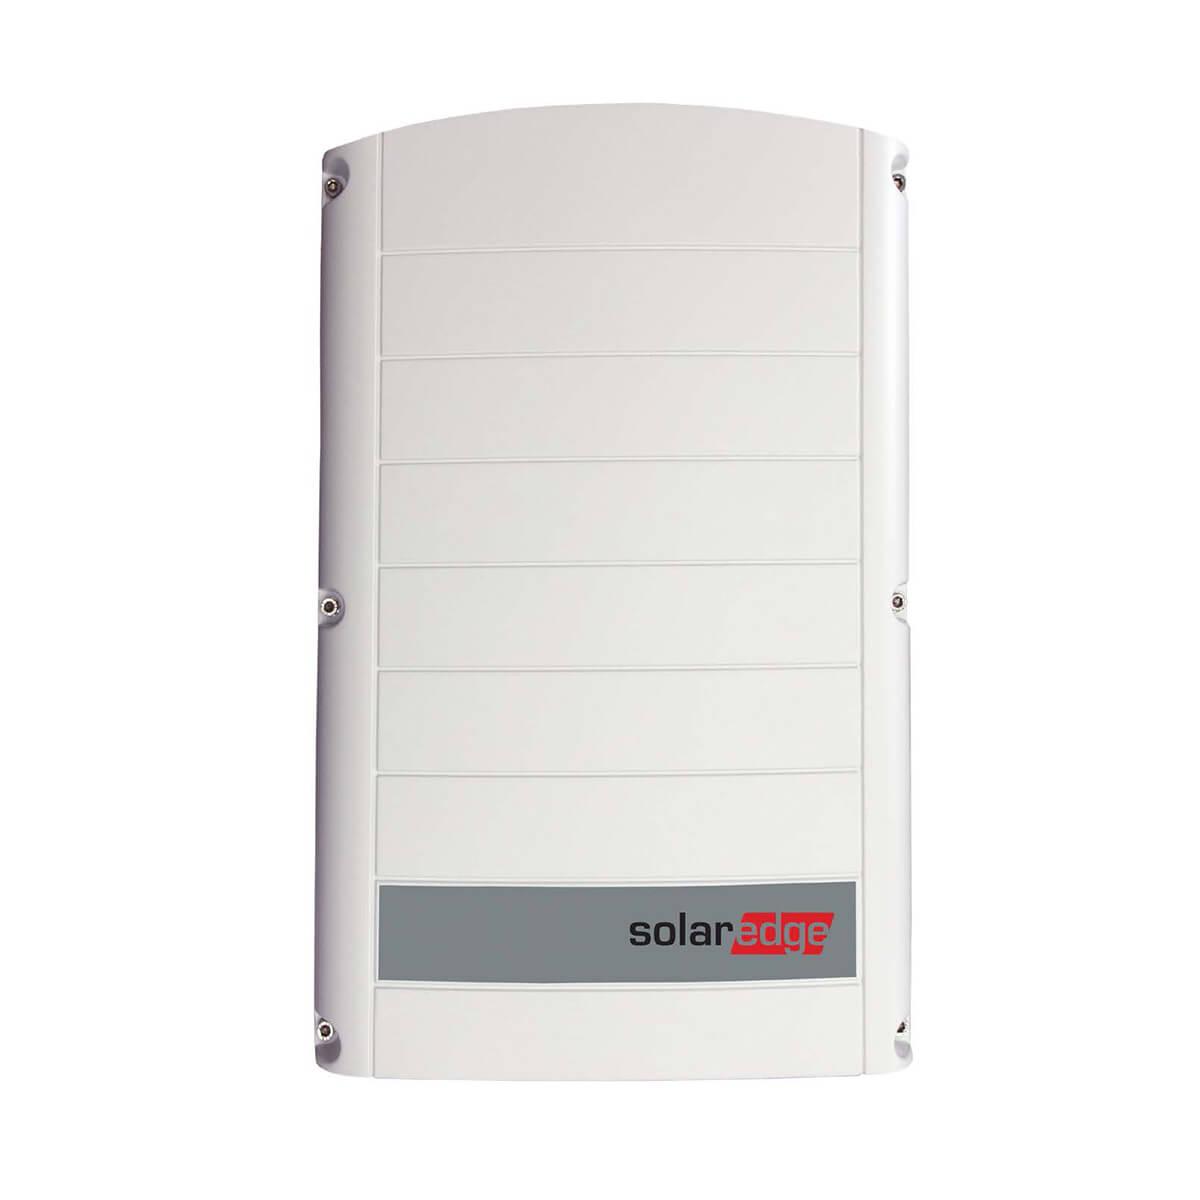 solaredge 9kW inverter, solaredge se9k 9kW inverter, solaredge se9k inverter, solaredge se9k, solaredge 9 kW, SOLAREDGE 9KW